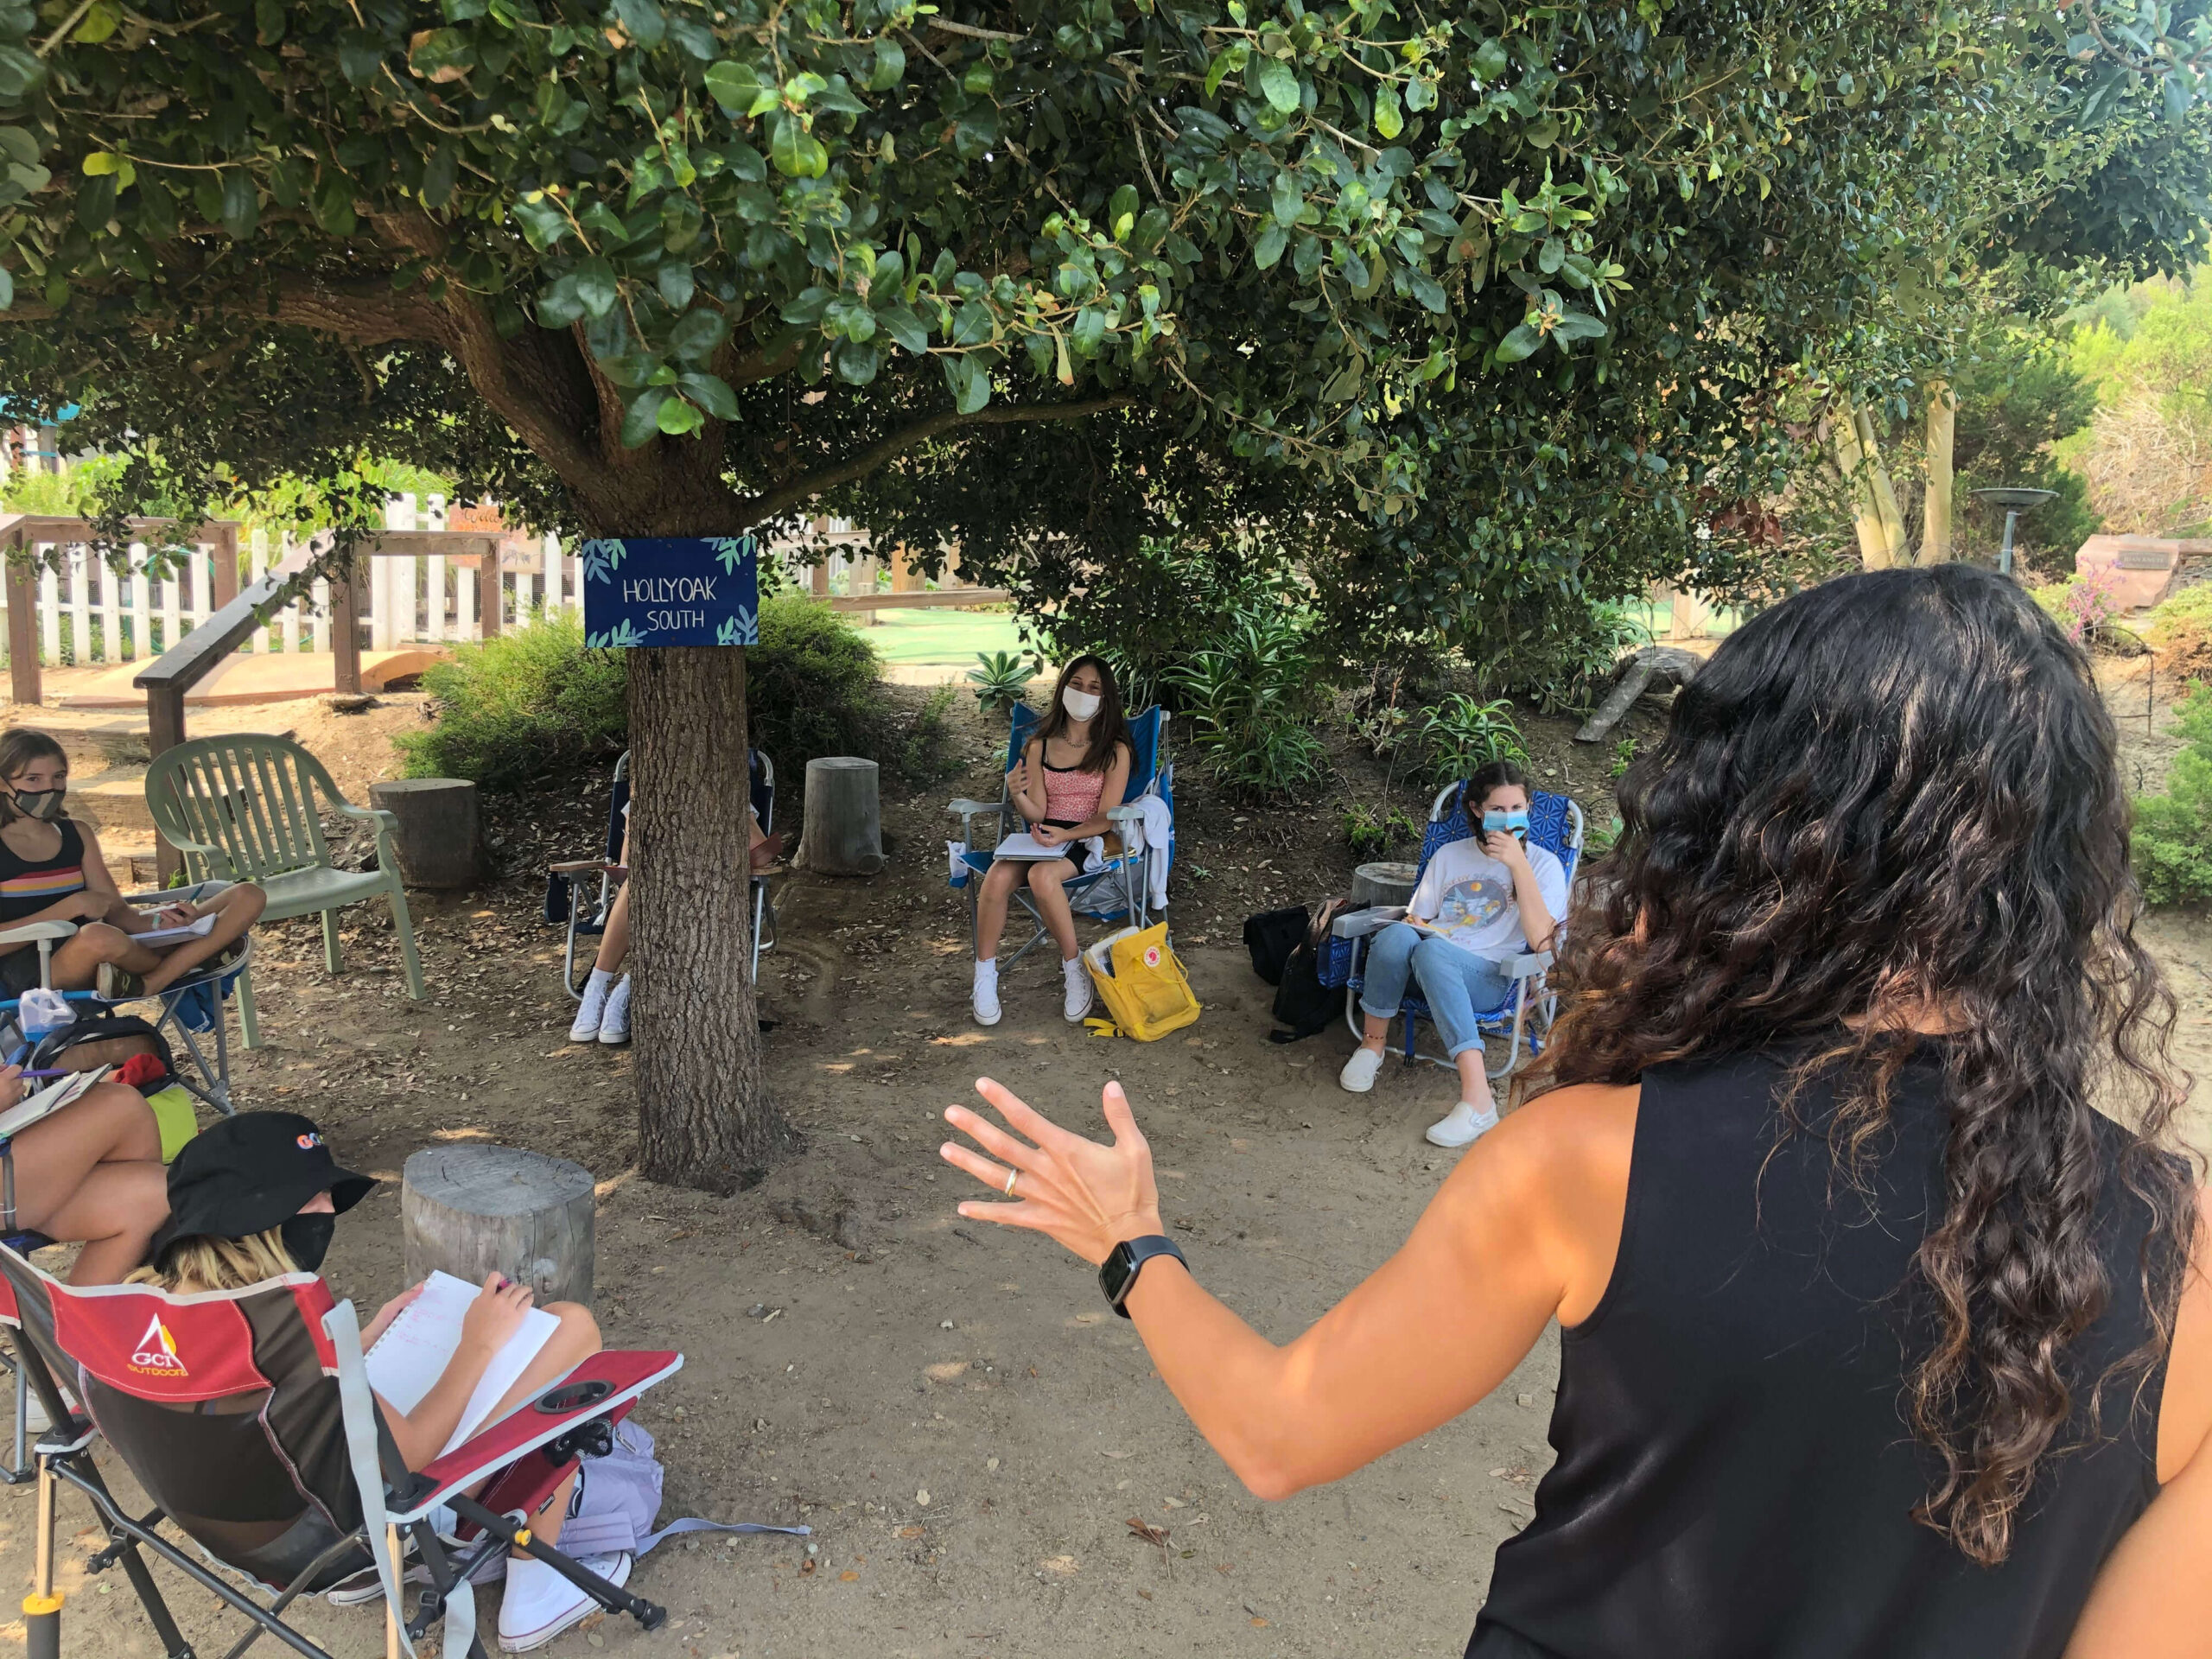 outdoor class under hollyoak at the grauer school in encinitas california